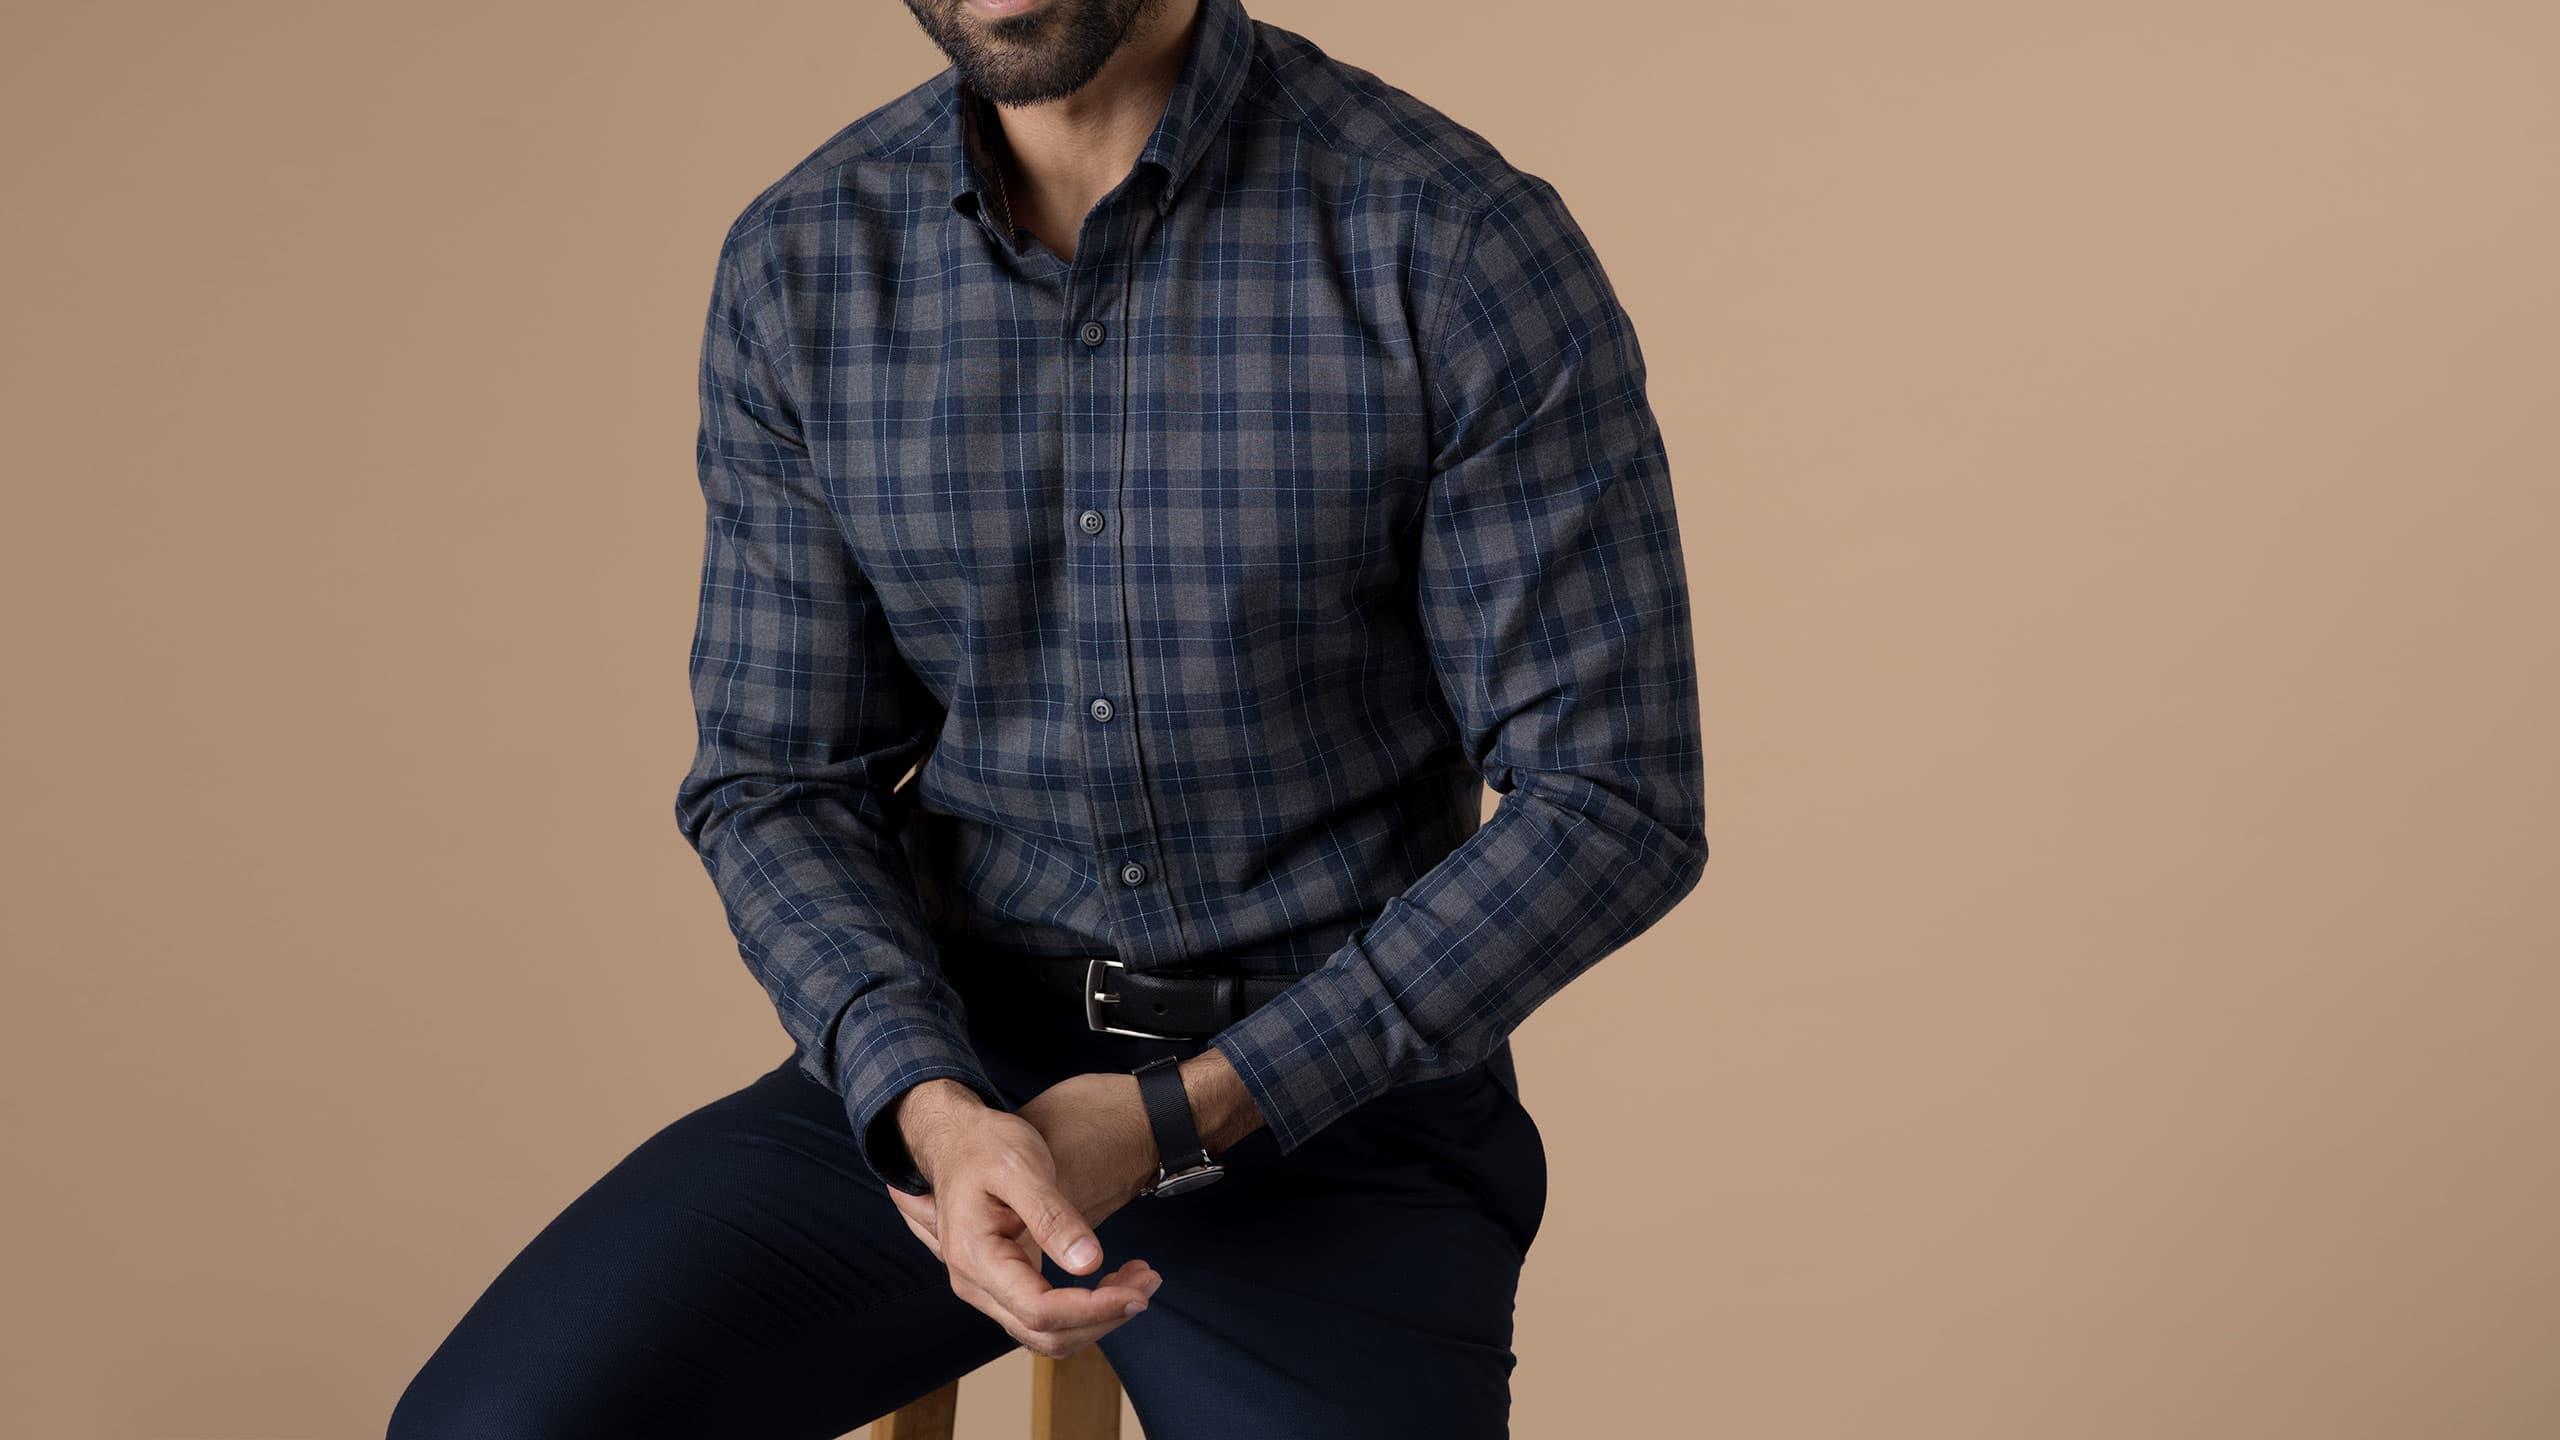 Buy Check Mate shirt online